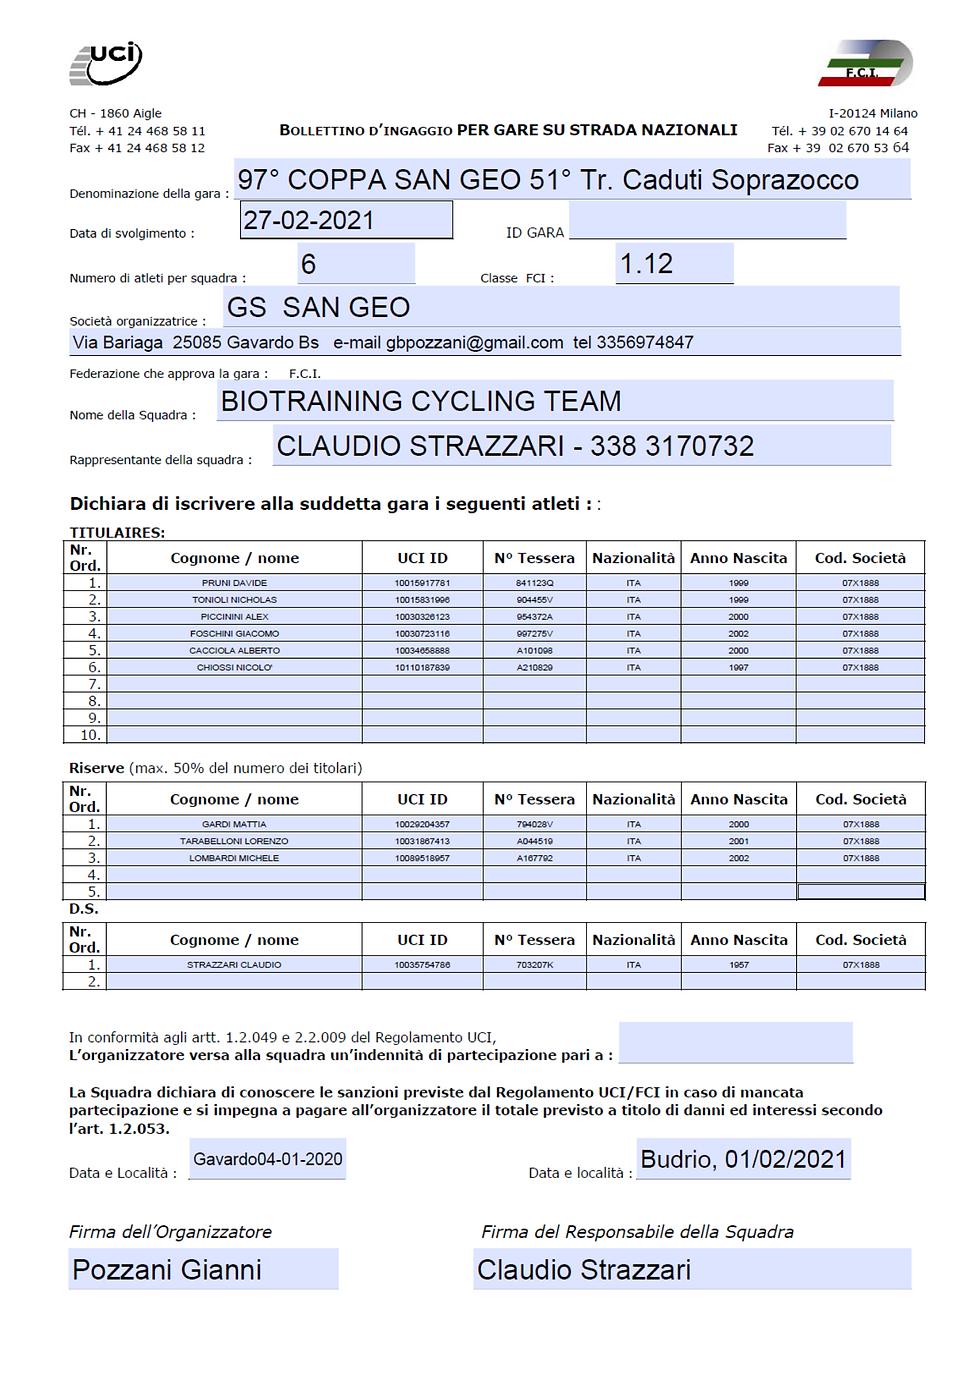 bollettino Team biotraining.png